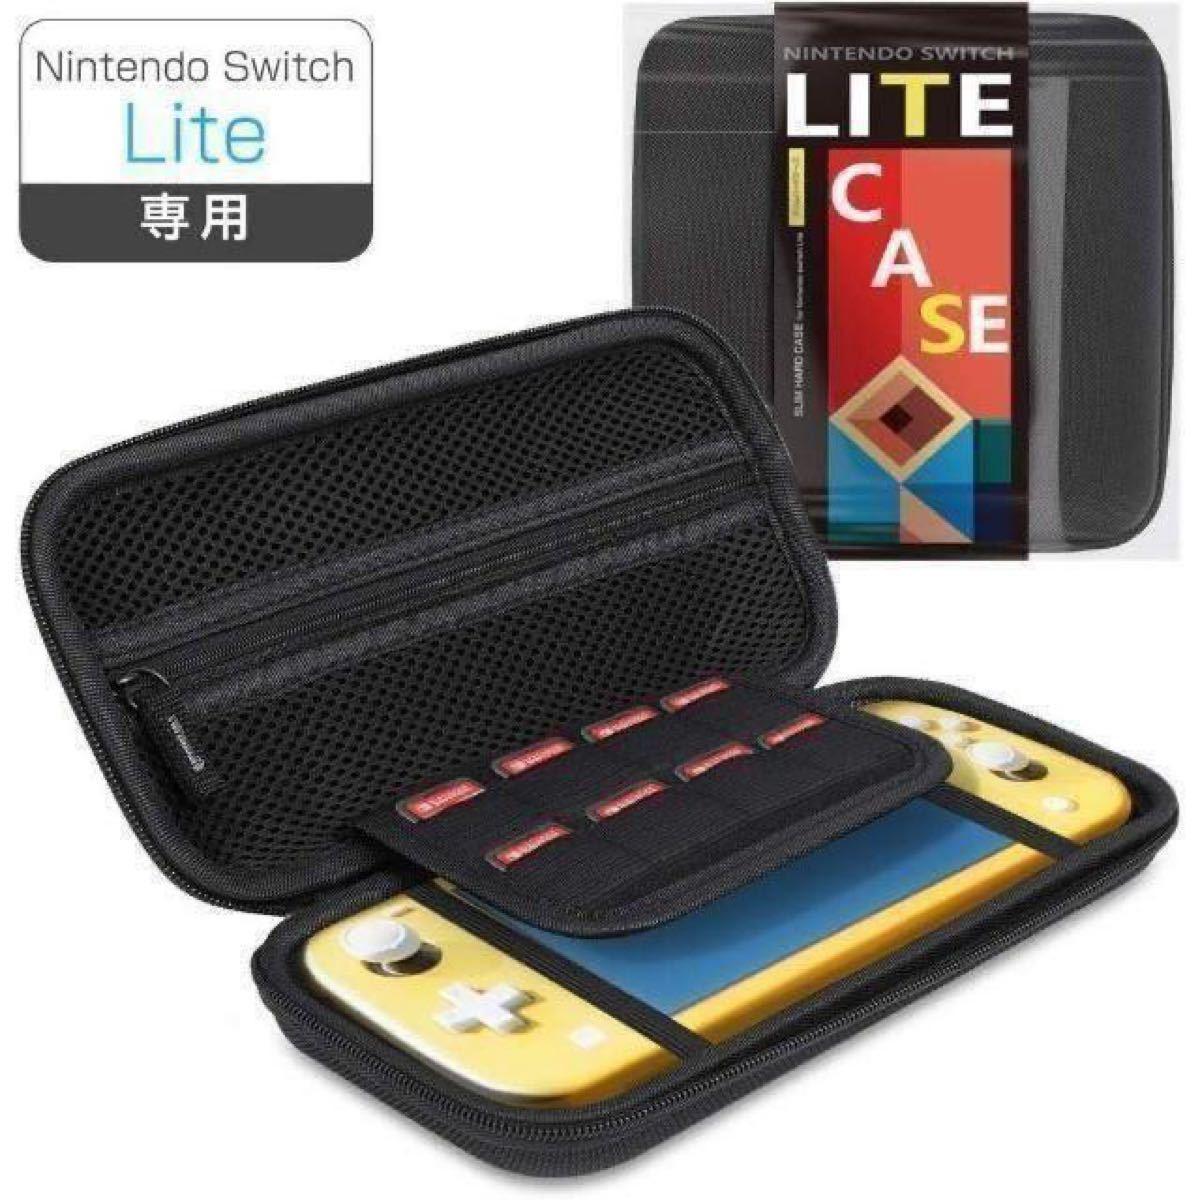 Nintendo Switch 任天堂スイッチ 収納バッグ 任天堂スイッチケース